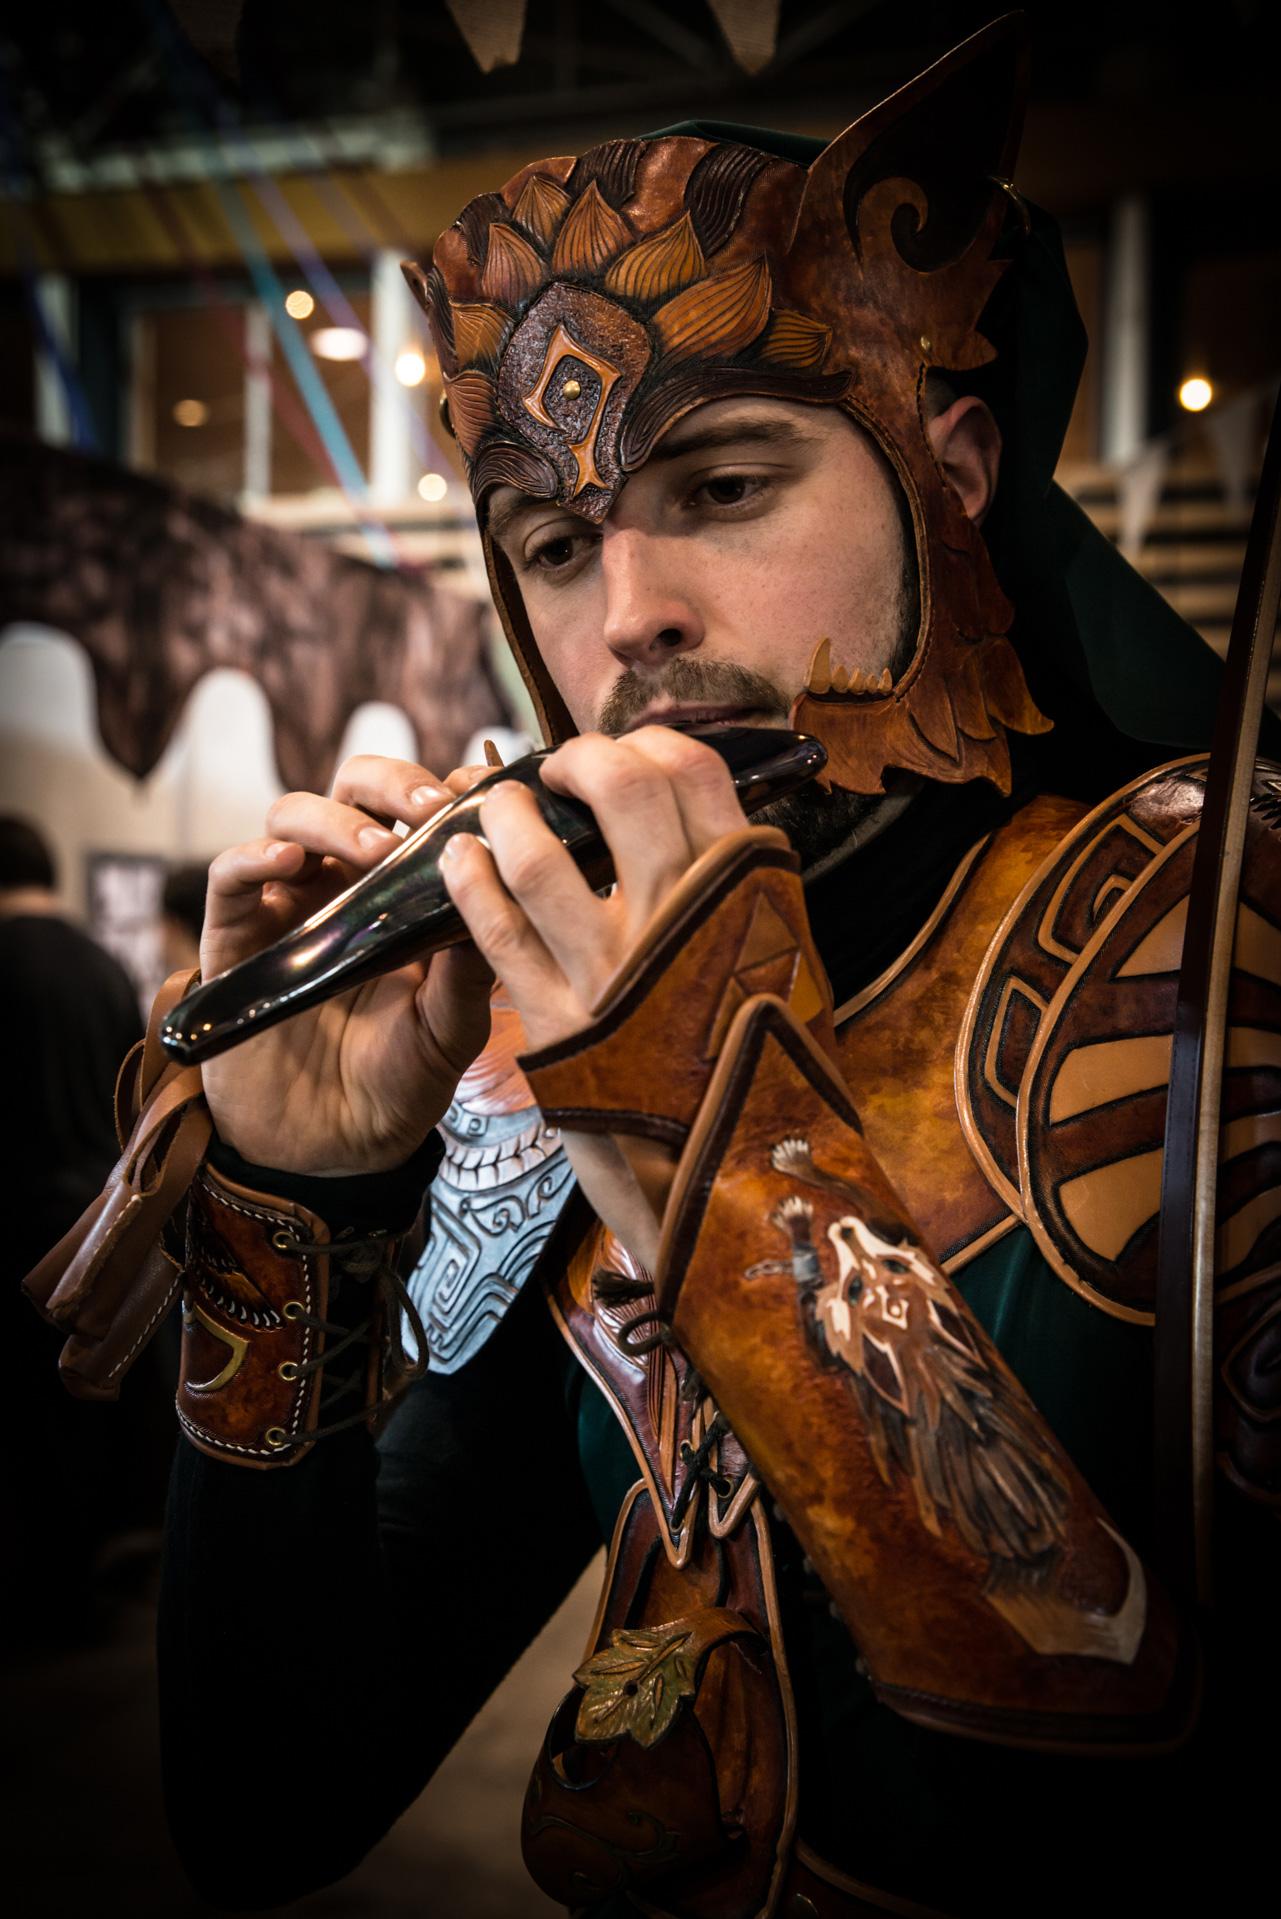 Musique à l'Ocarina